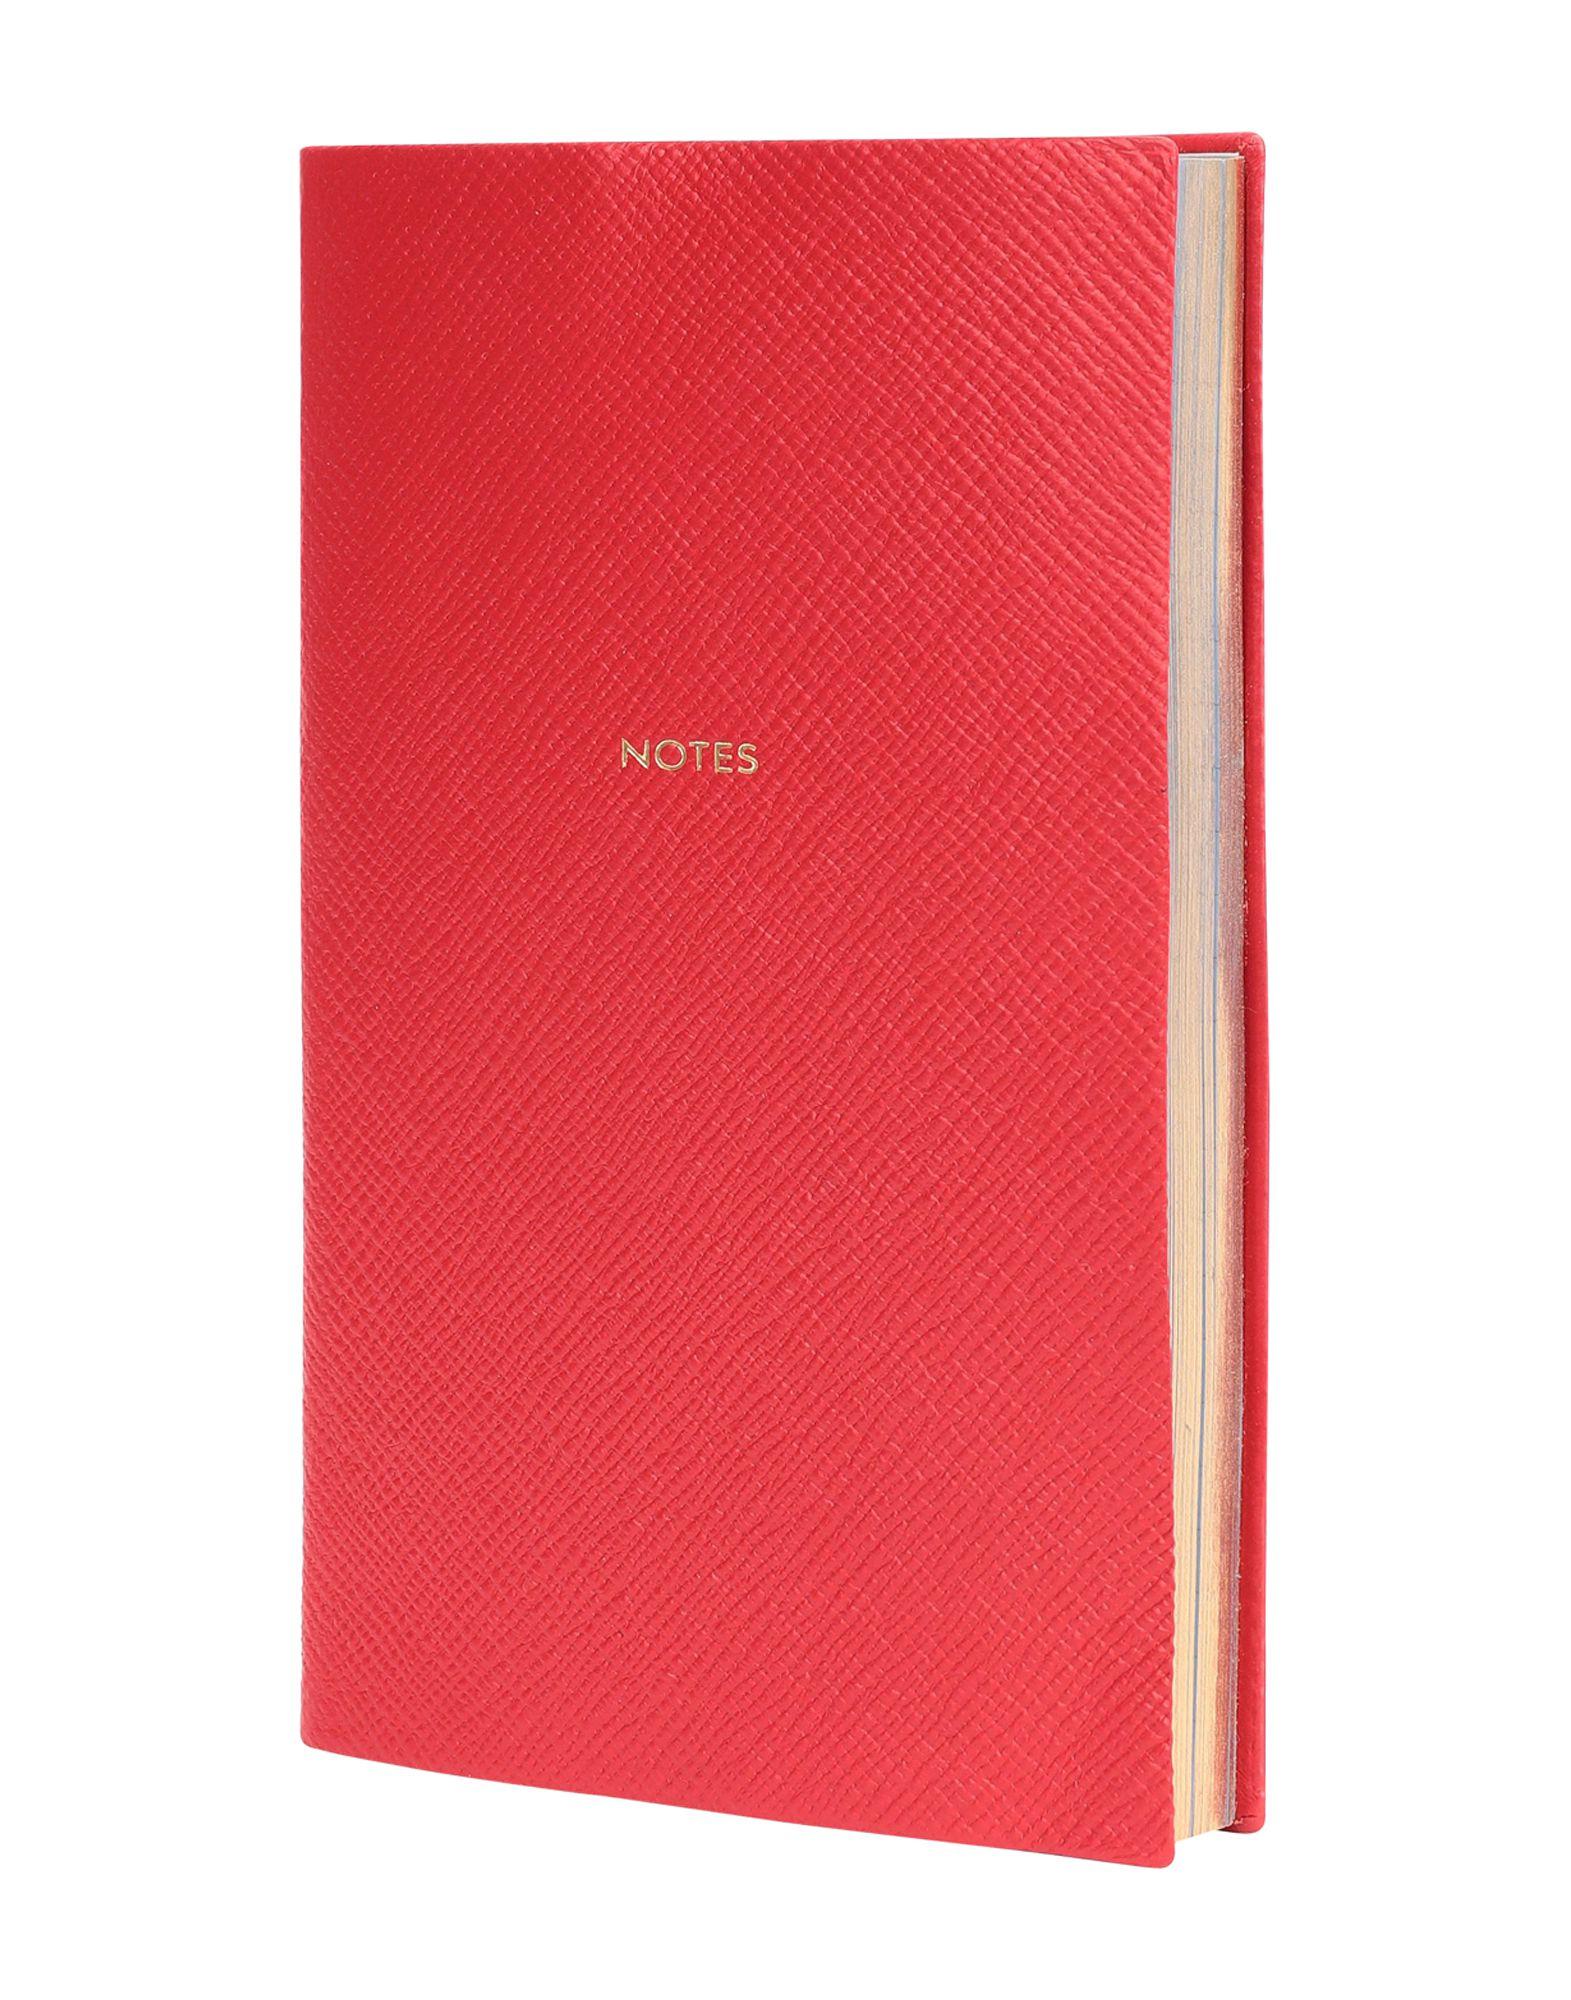 SMYTHSON Записная книжка cross записная книжка с ручкой ac236 1s